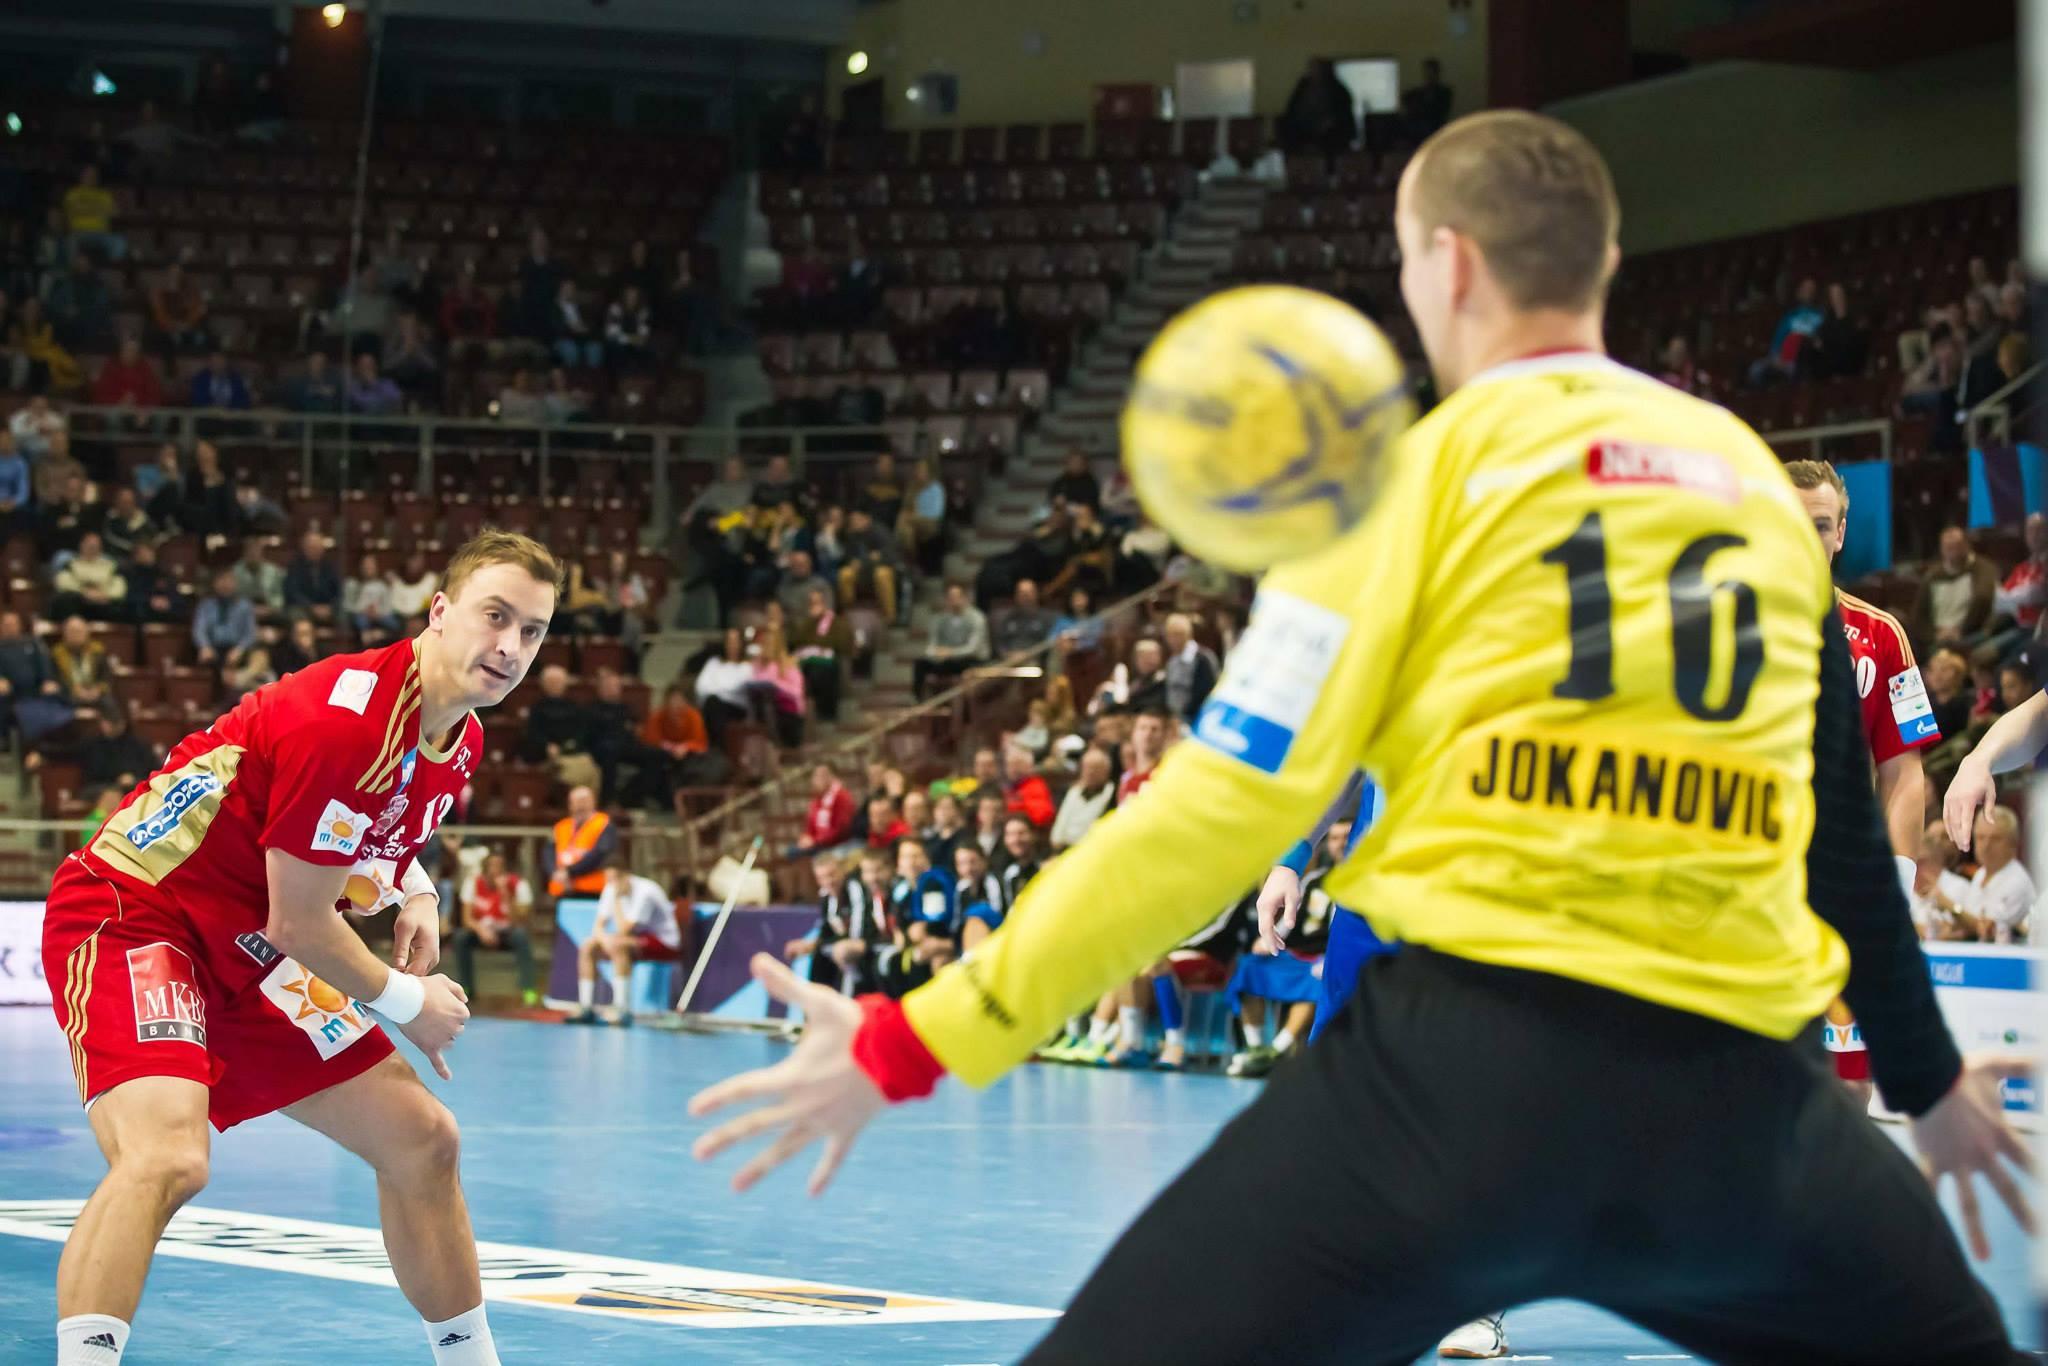 Fotó: http://seha-liga.com/ Melczer Zsolt